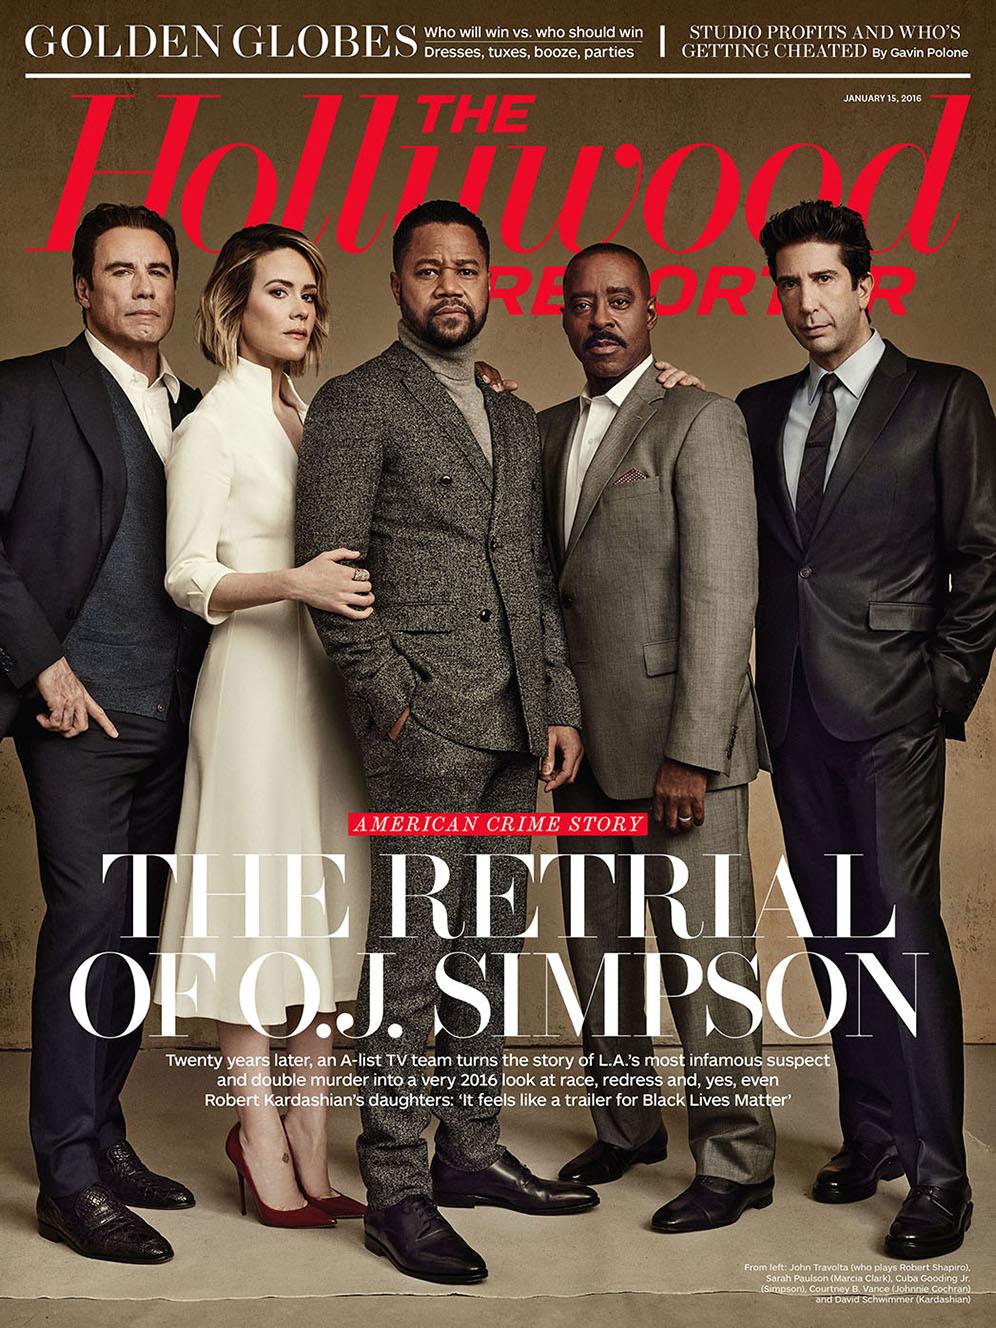 Cuba Gooding Jr. Said He Had An Emotional Breakdown Portraying O.J. Simpson